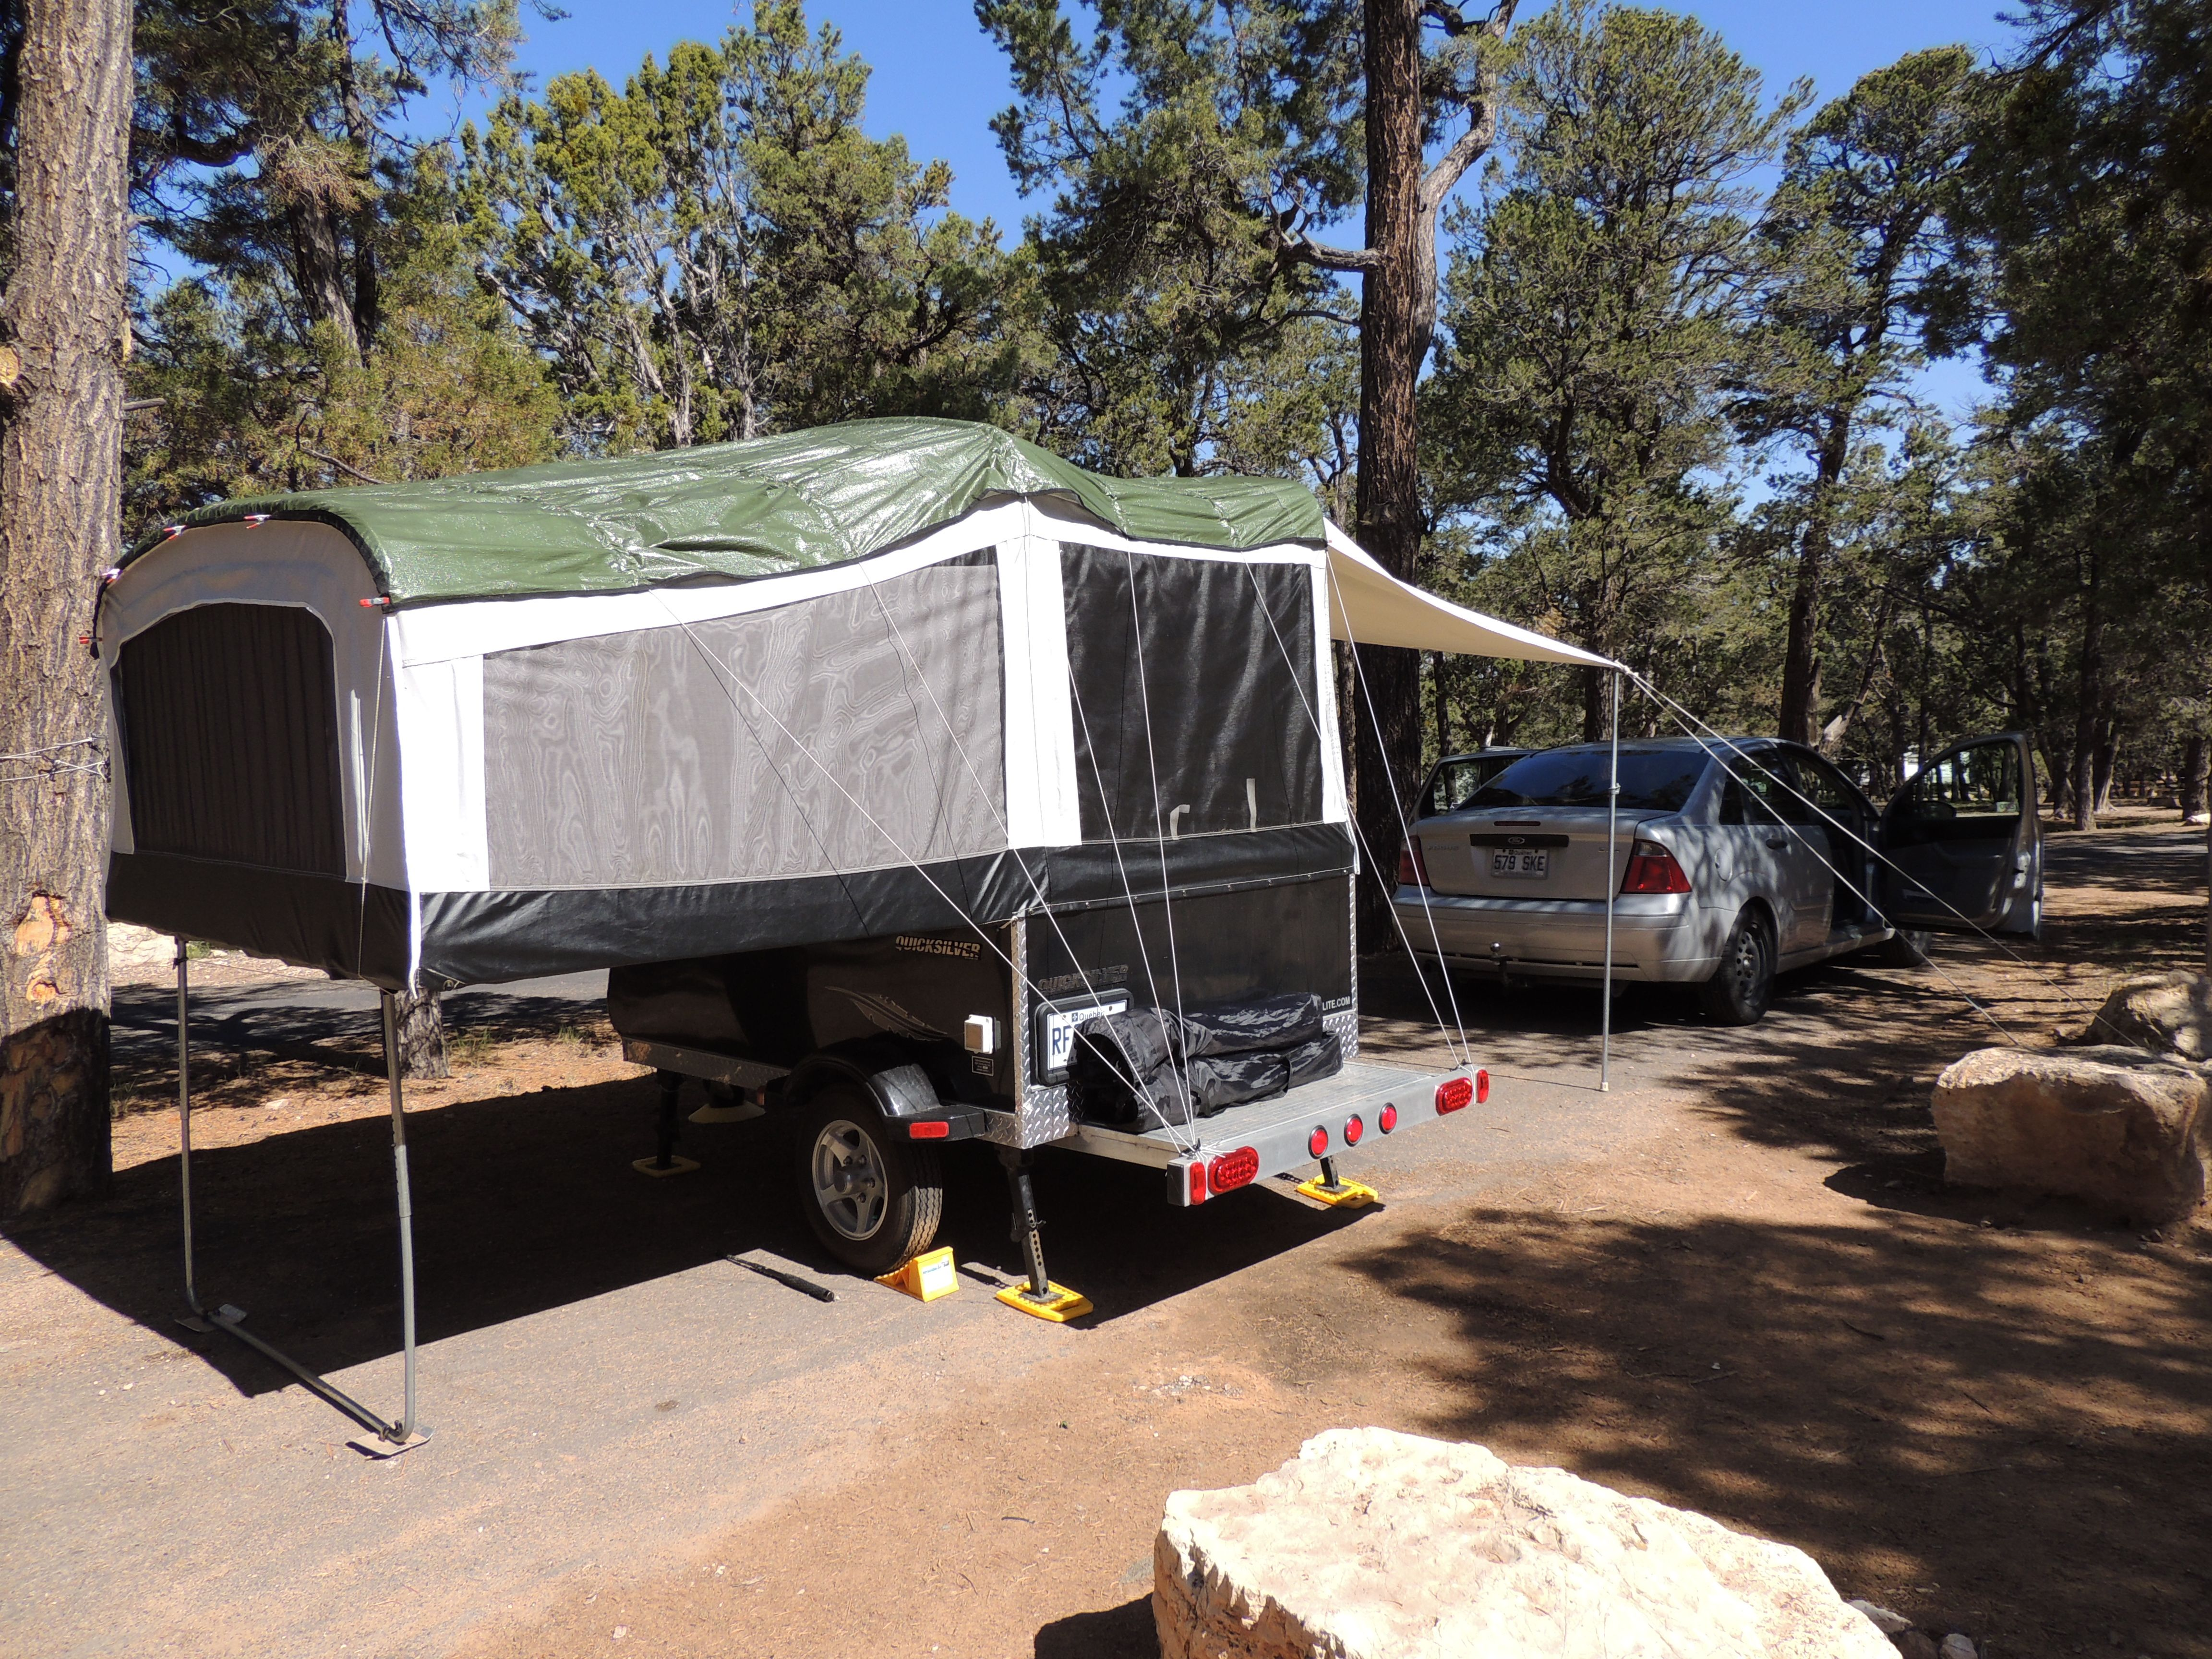 Mather campground terrain 206, Grand Canyon, Arizona